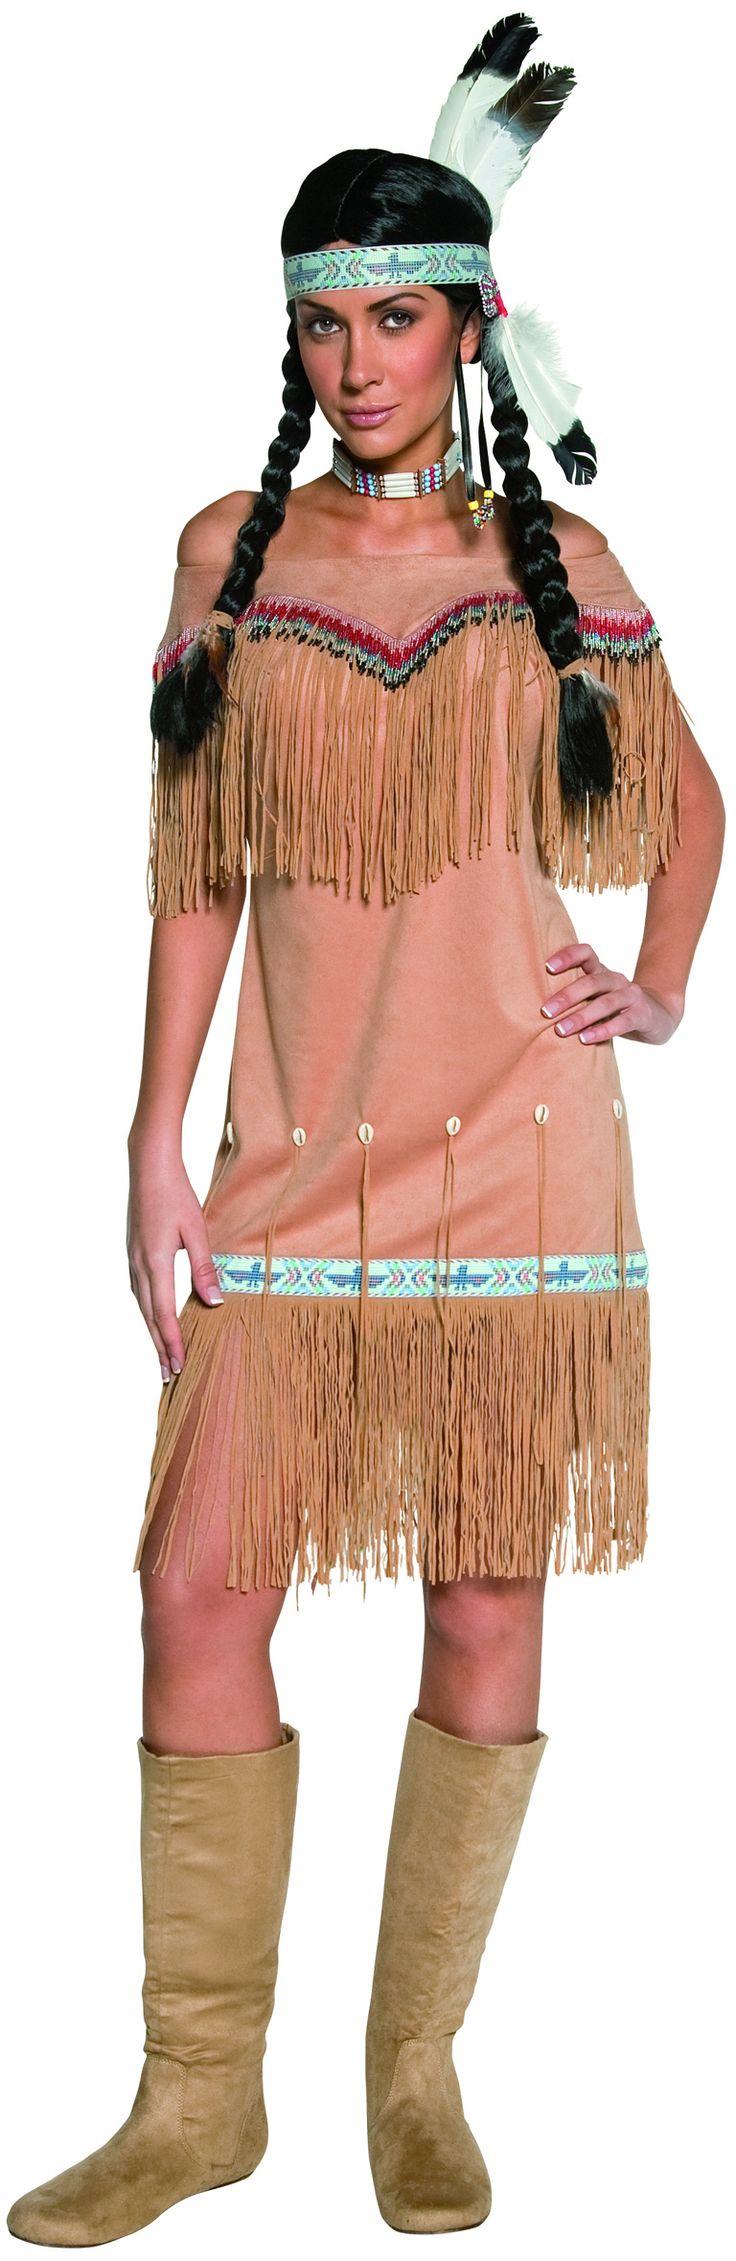 Disfraz de India para mujer Disponible en: http://www.vegaoo.es/disfraz-de-india-para-mujer-bis-bis-bis-bis.html?type=product